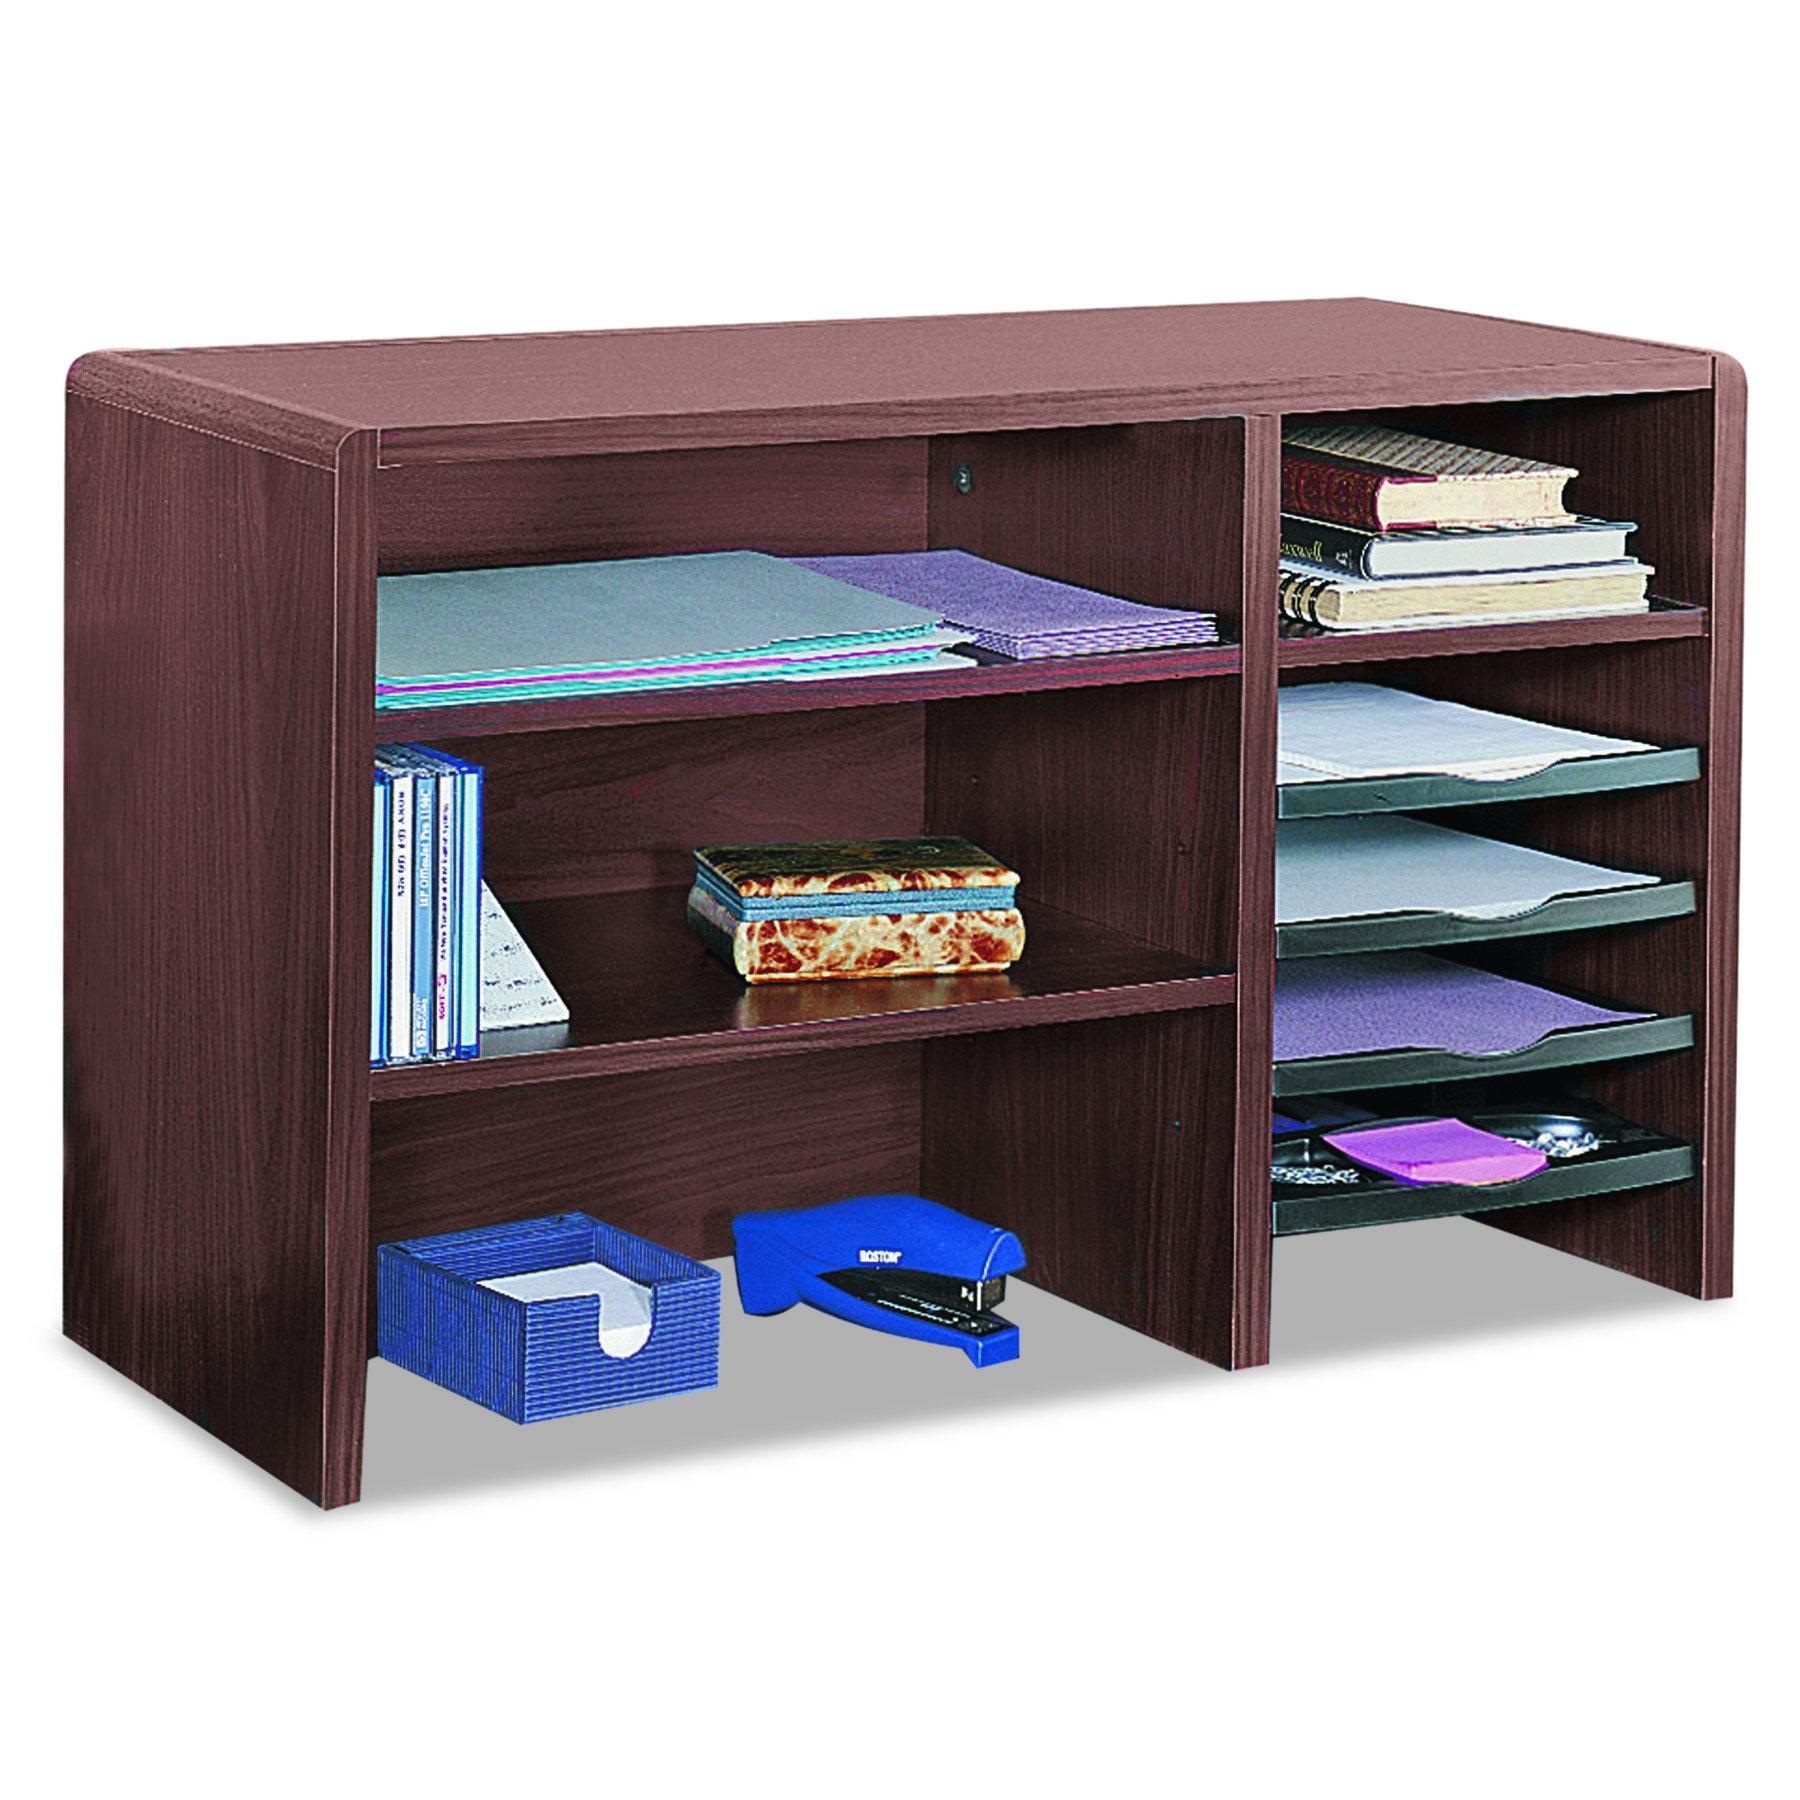 Safco 3692MH Desktop Organizer, Nine Sections, 29 x 12 x 18, Mahogany